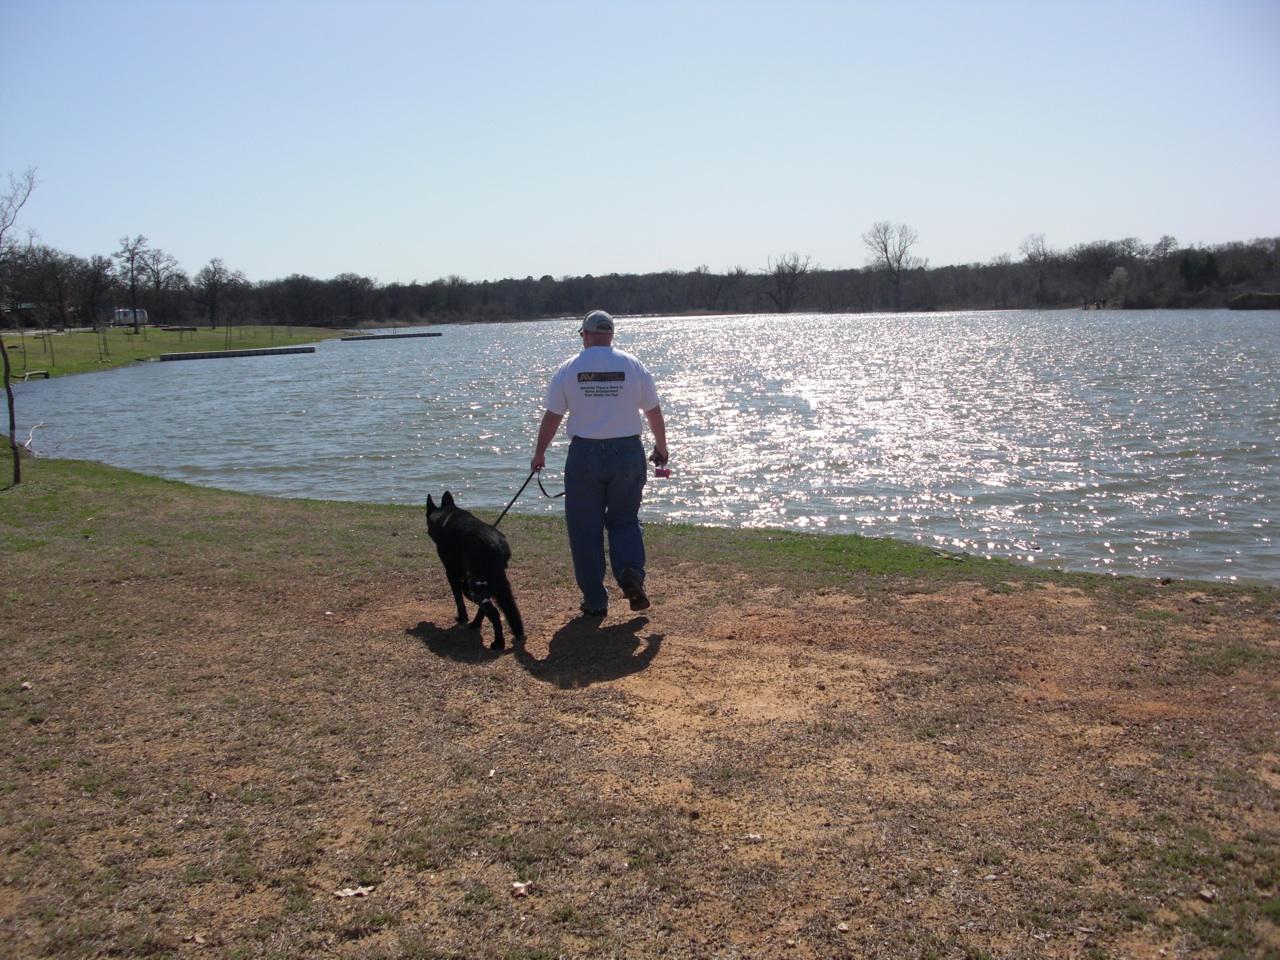 David & Tasha Enjoying the Nice Weather at The Vineyards Campground in Grapevine, TX.